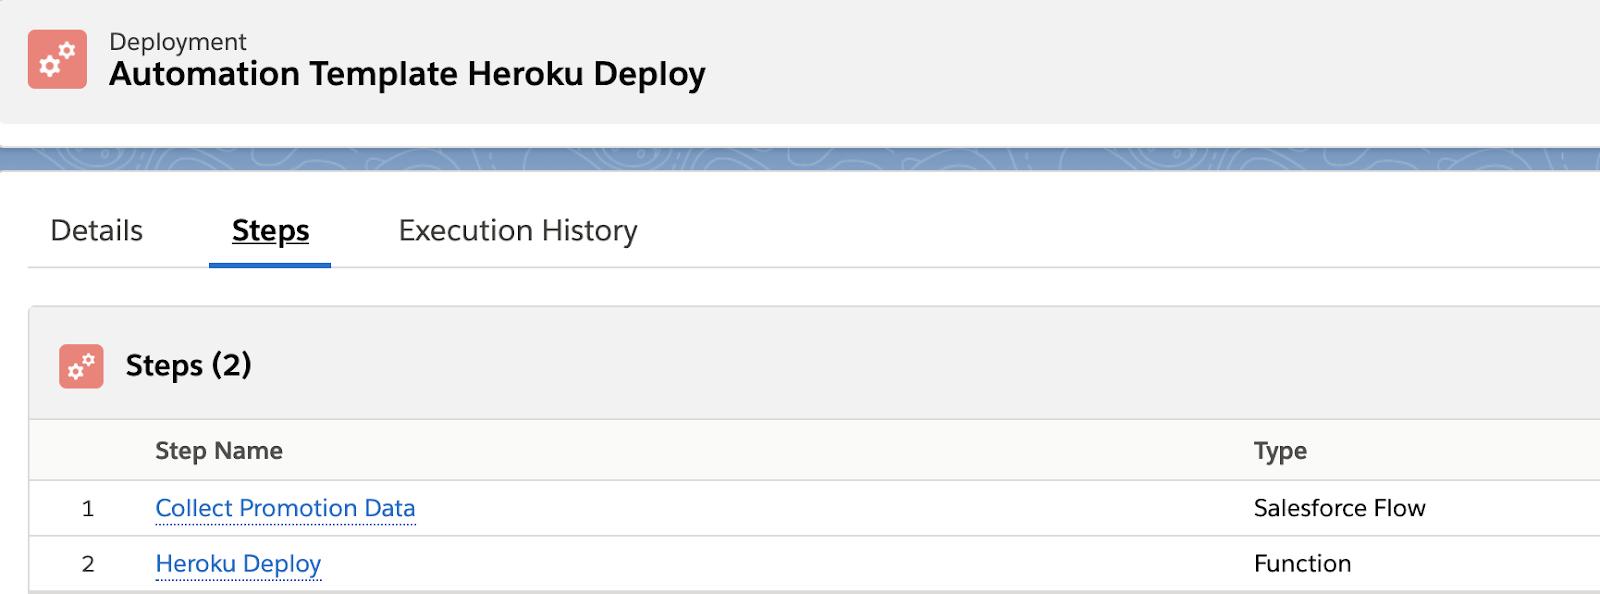 Heroku Deploy automation template